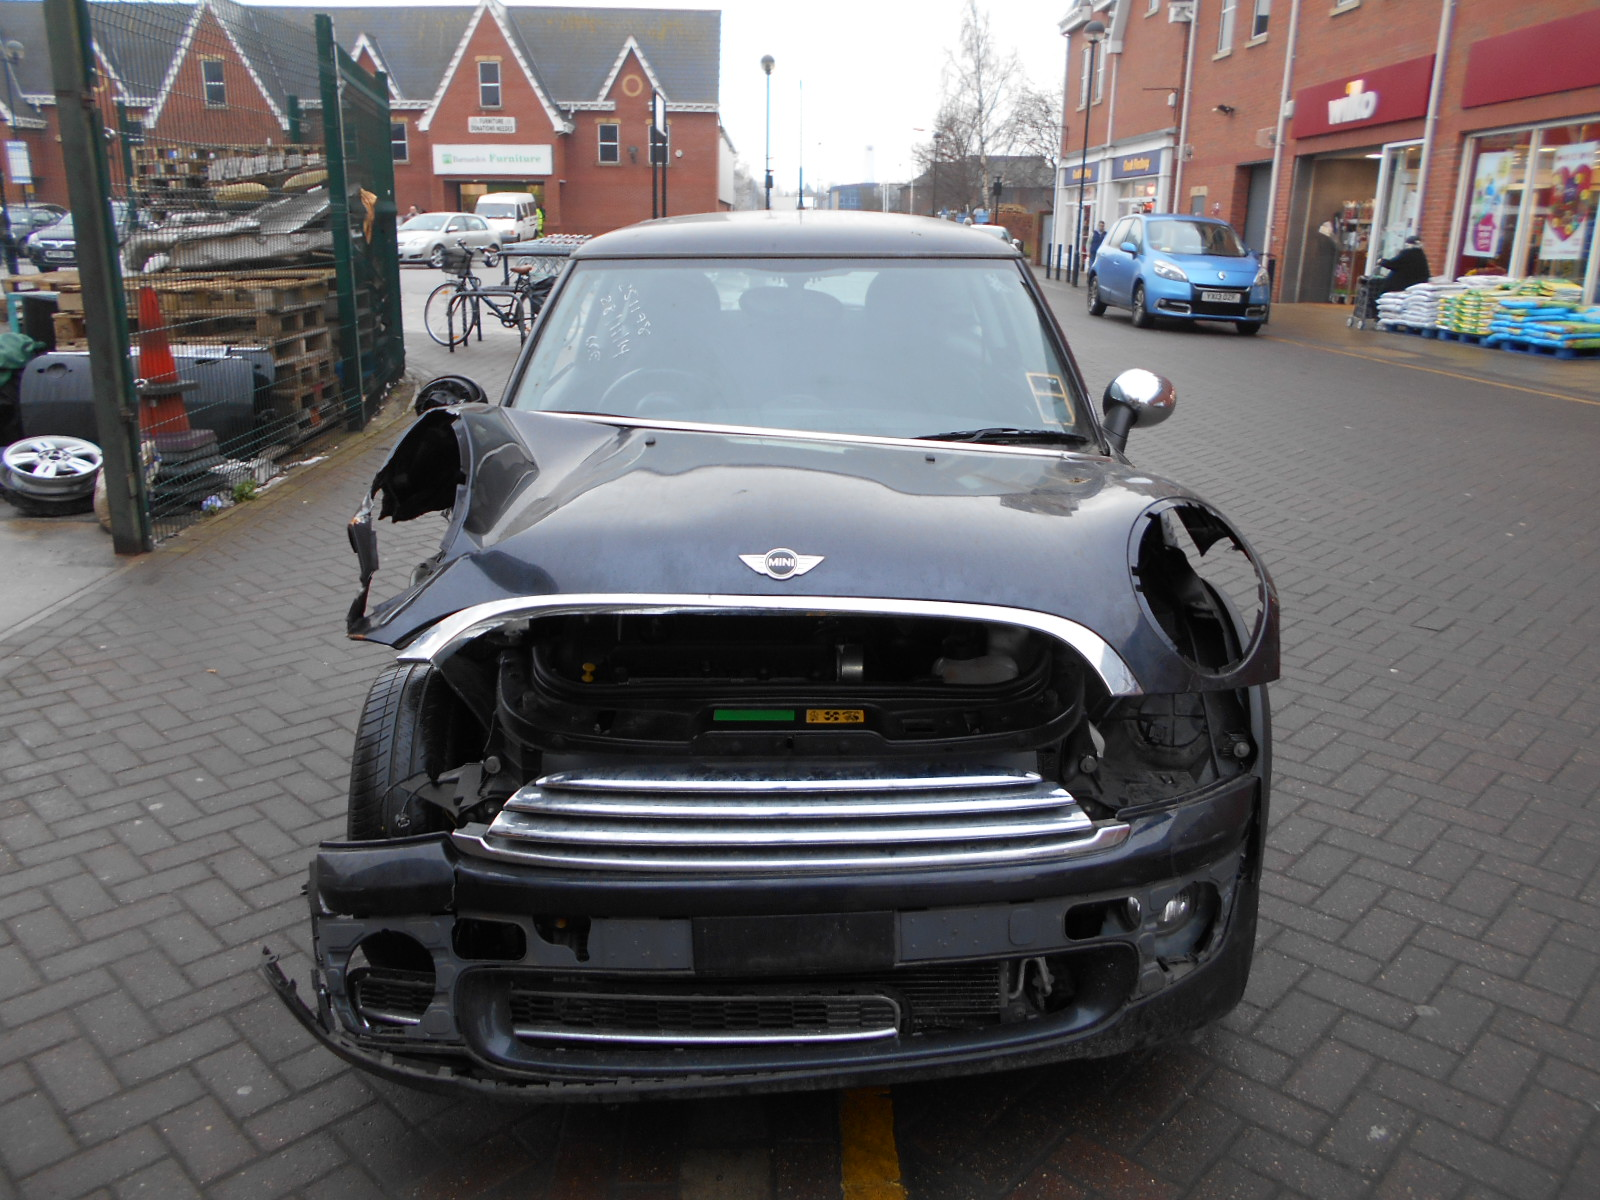 08 Black 1.4 BMW Mini One - 5